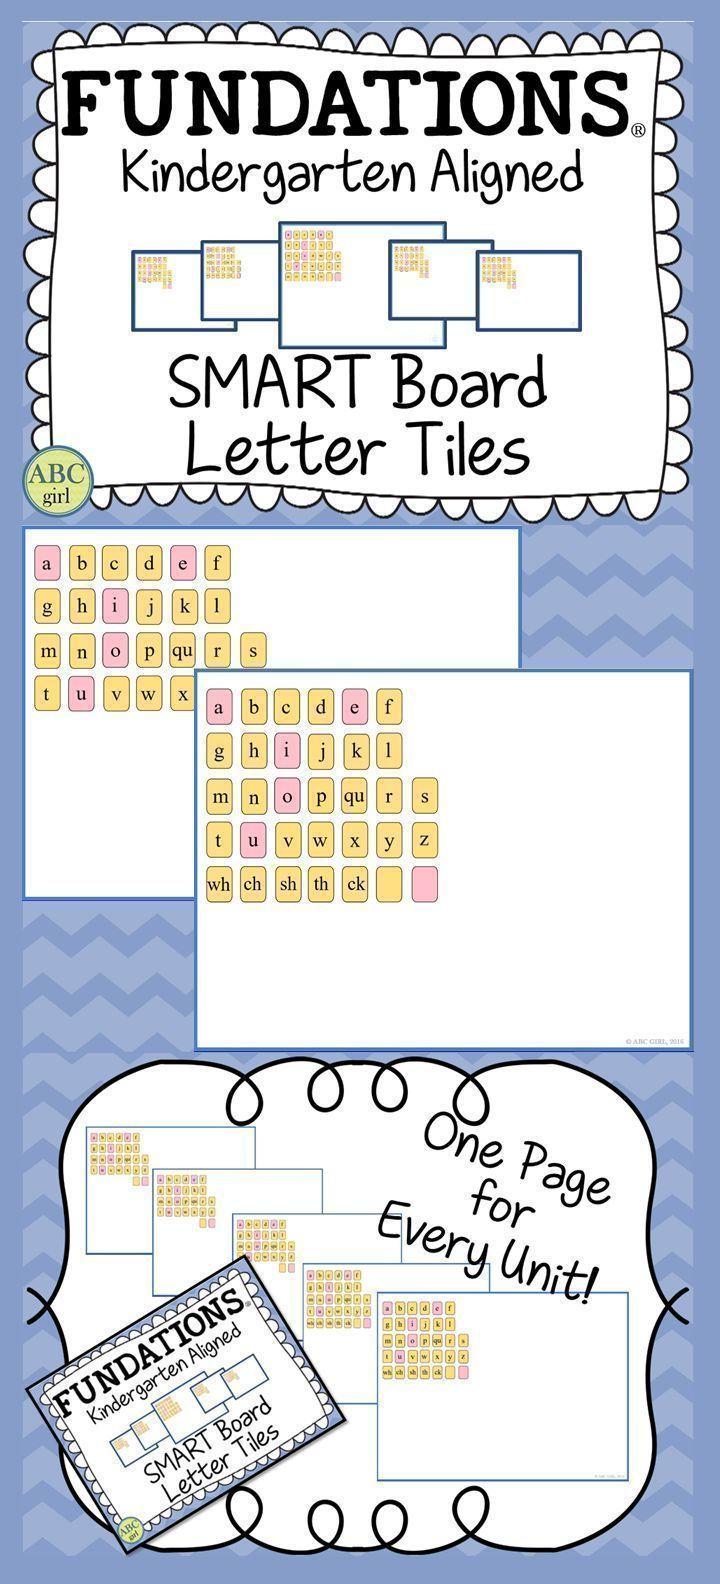 Worksheet Reading Level K 1000 images about k 2 hot literacy resources on pinterest level smartboard letter tiles for phonics word work reading spelling